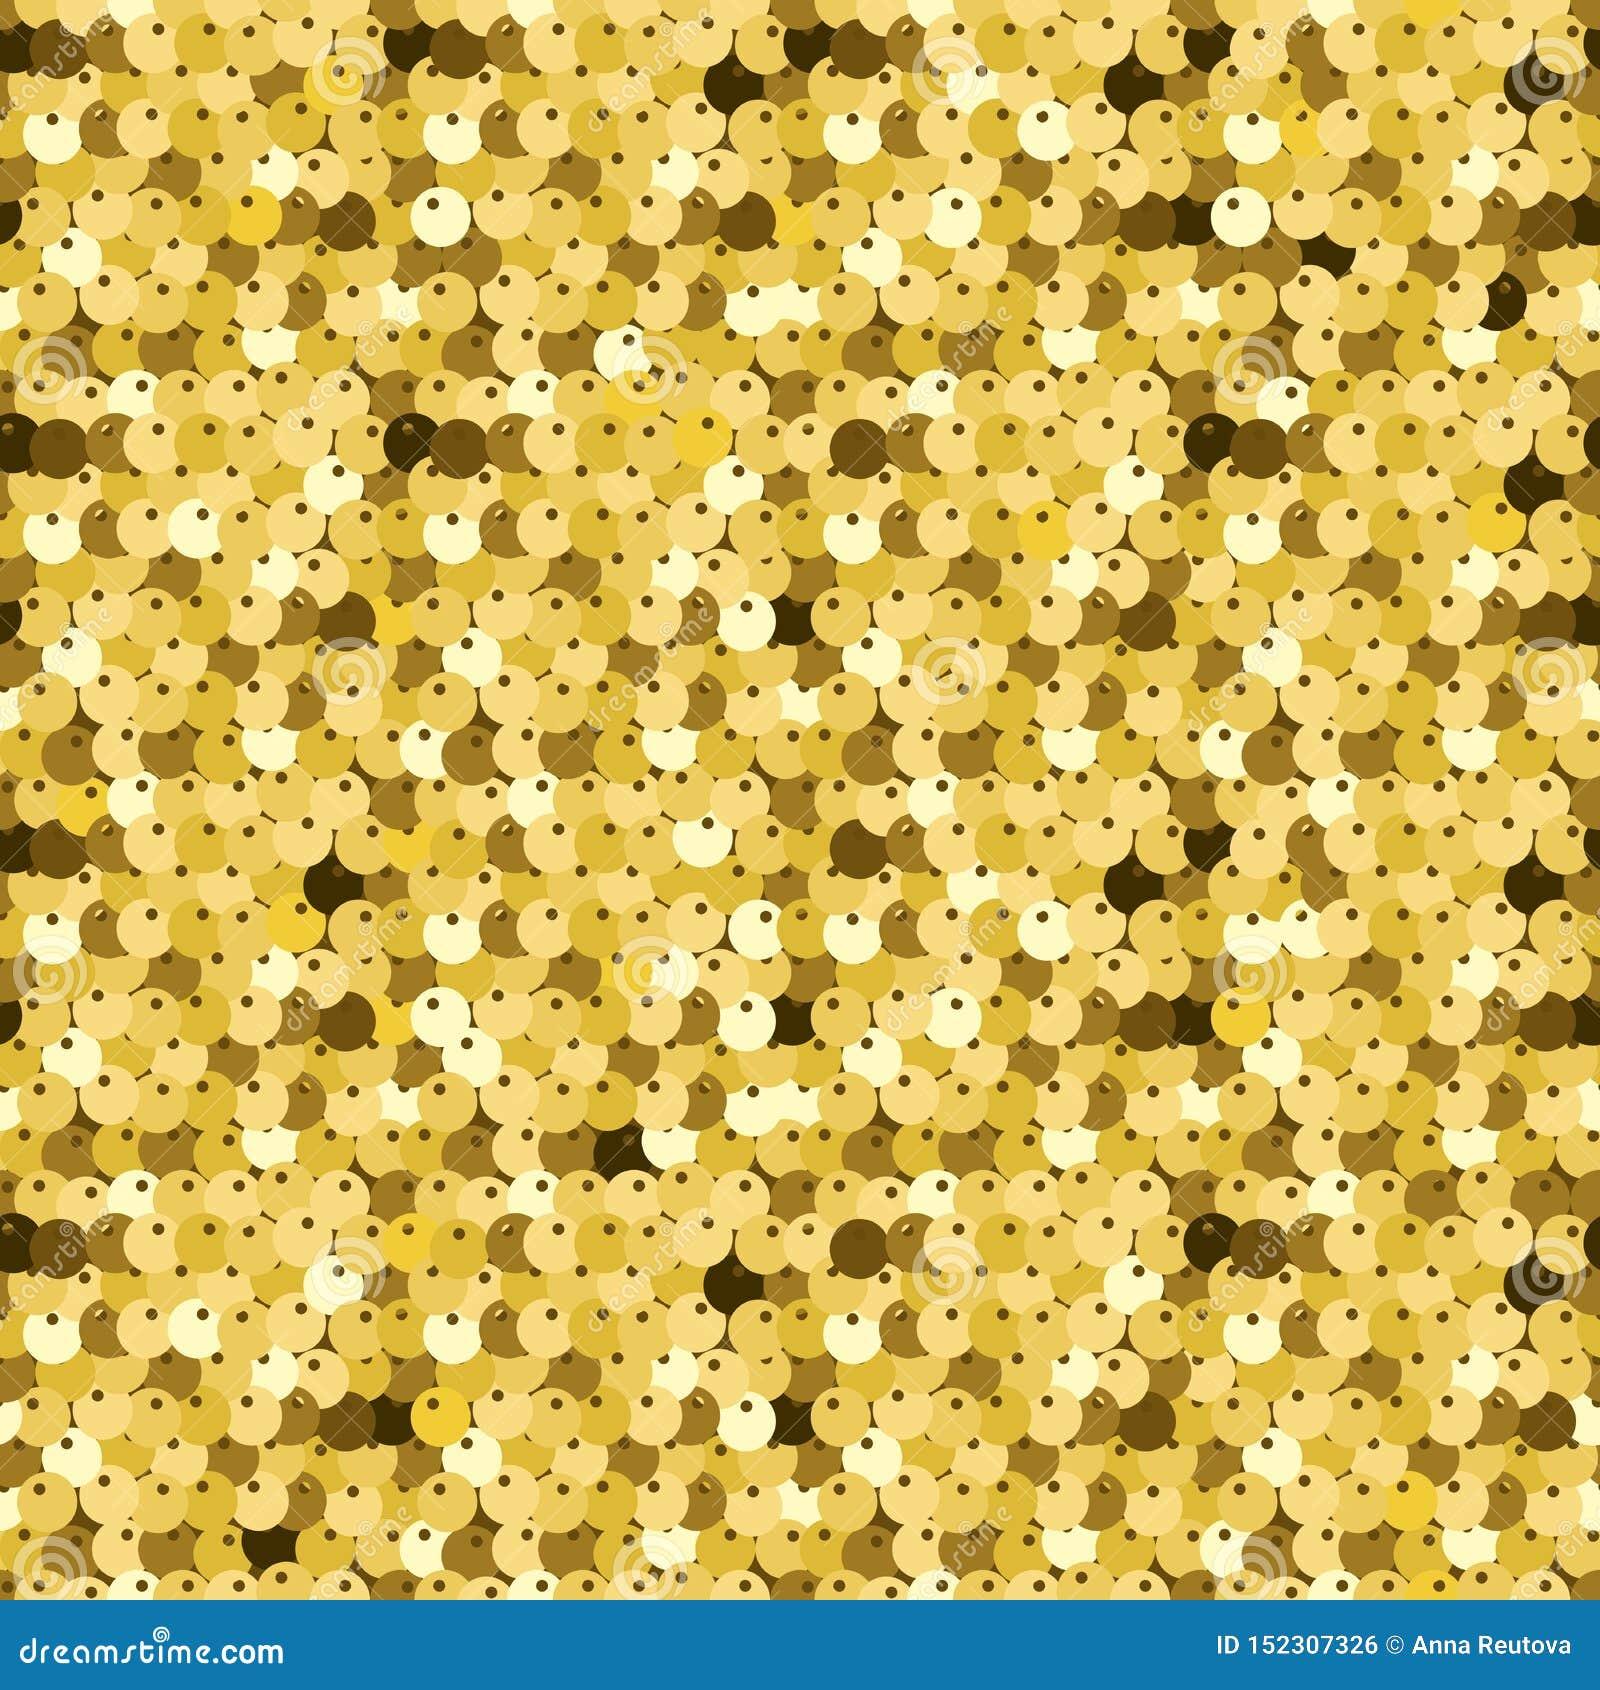 Gold Sequins. Luxury Texture, Glisten Paillettes. Stock Vector ...